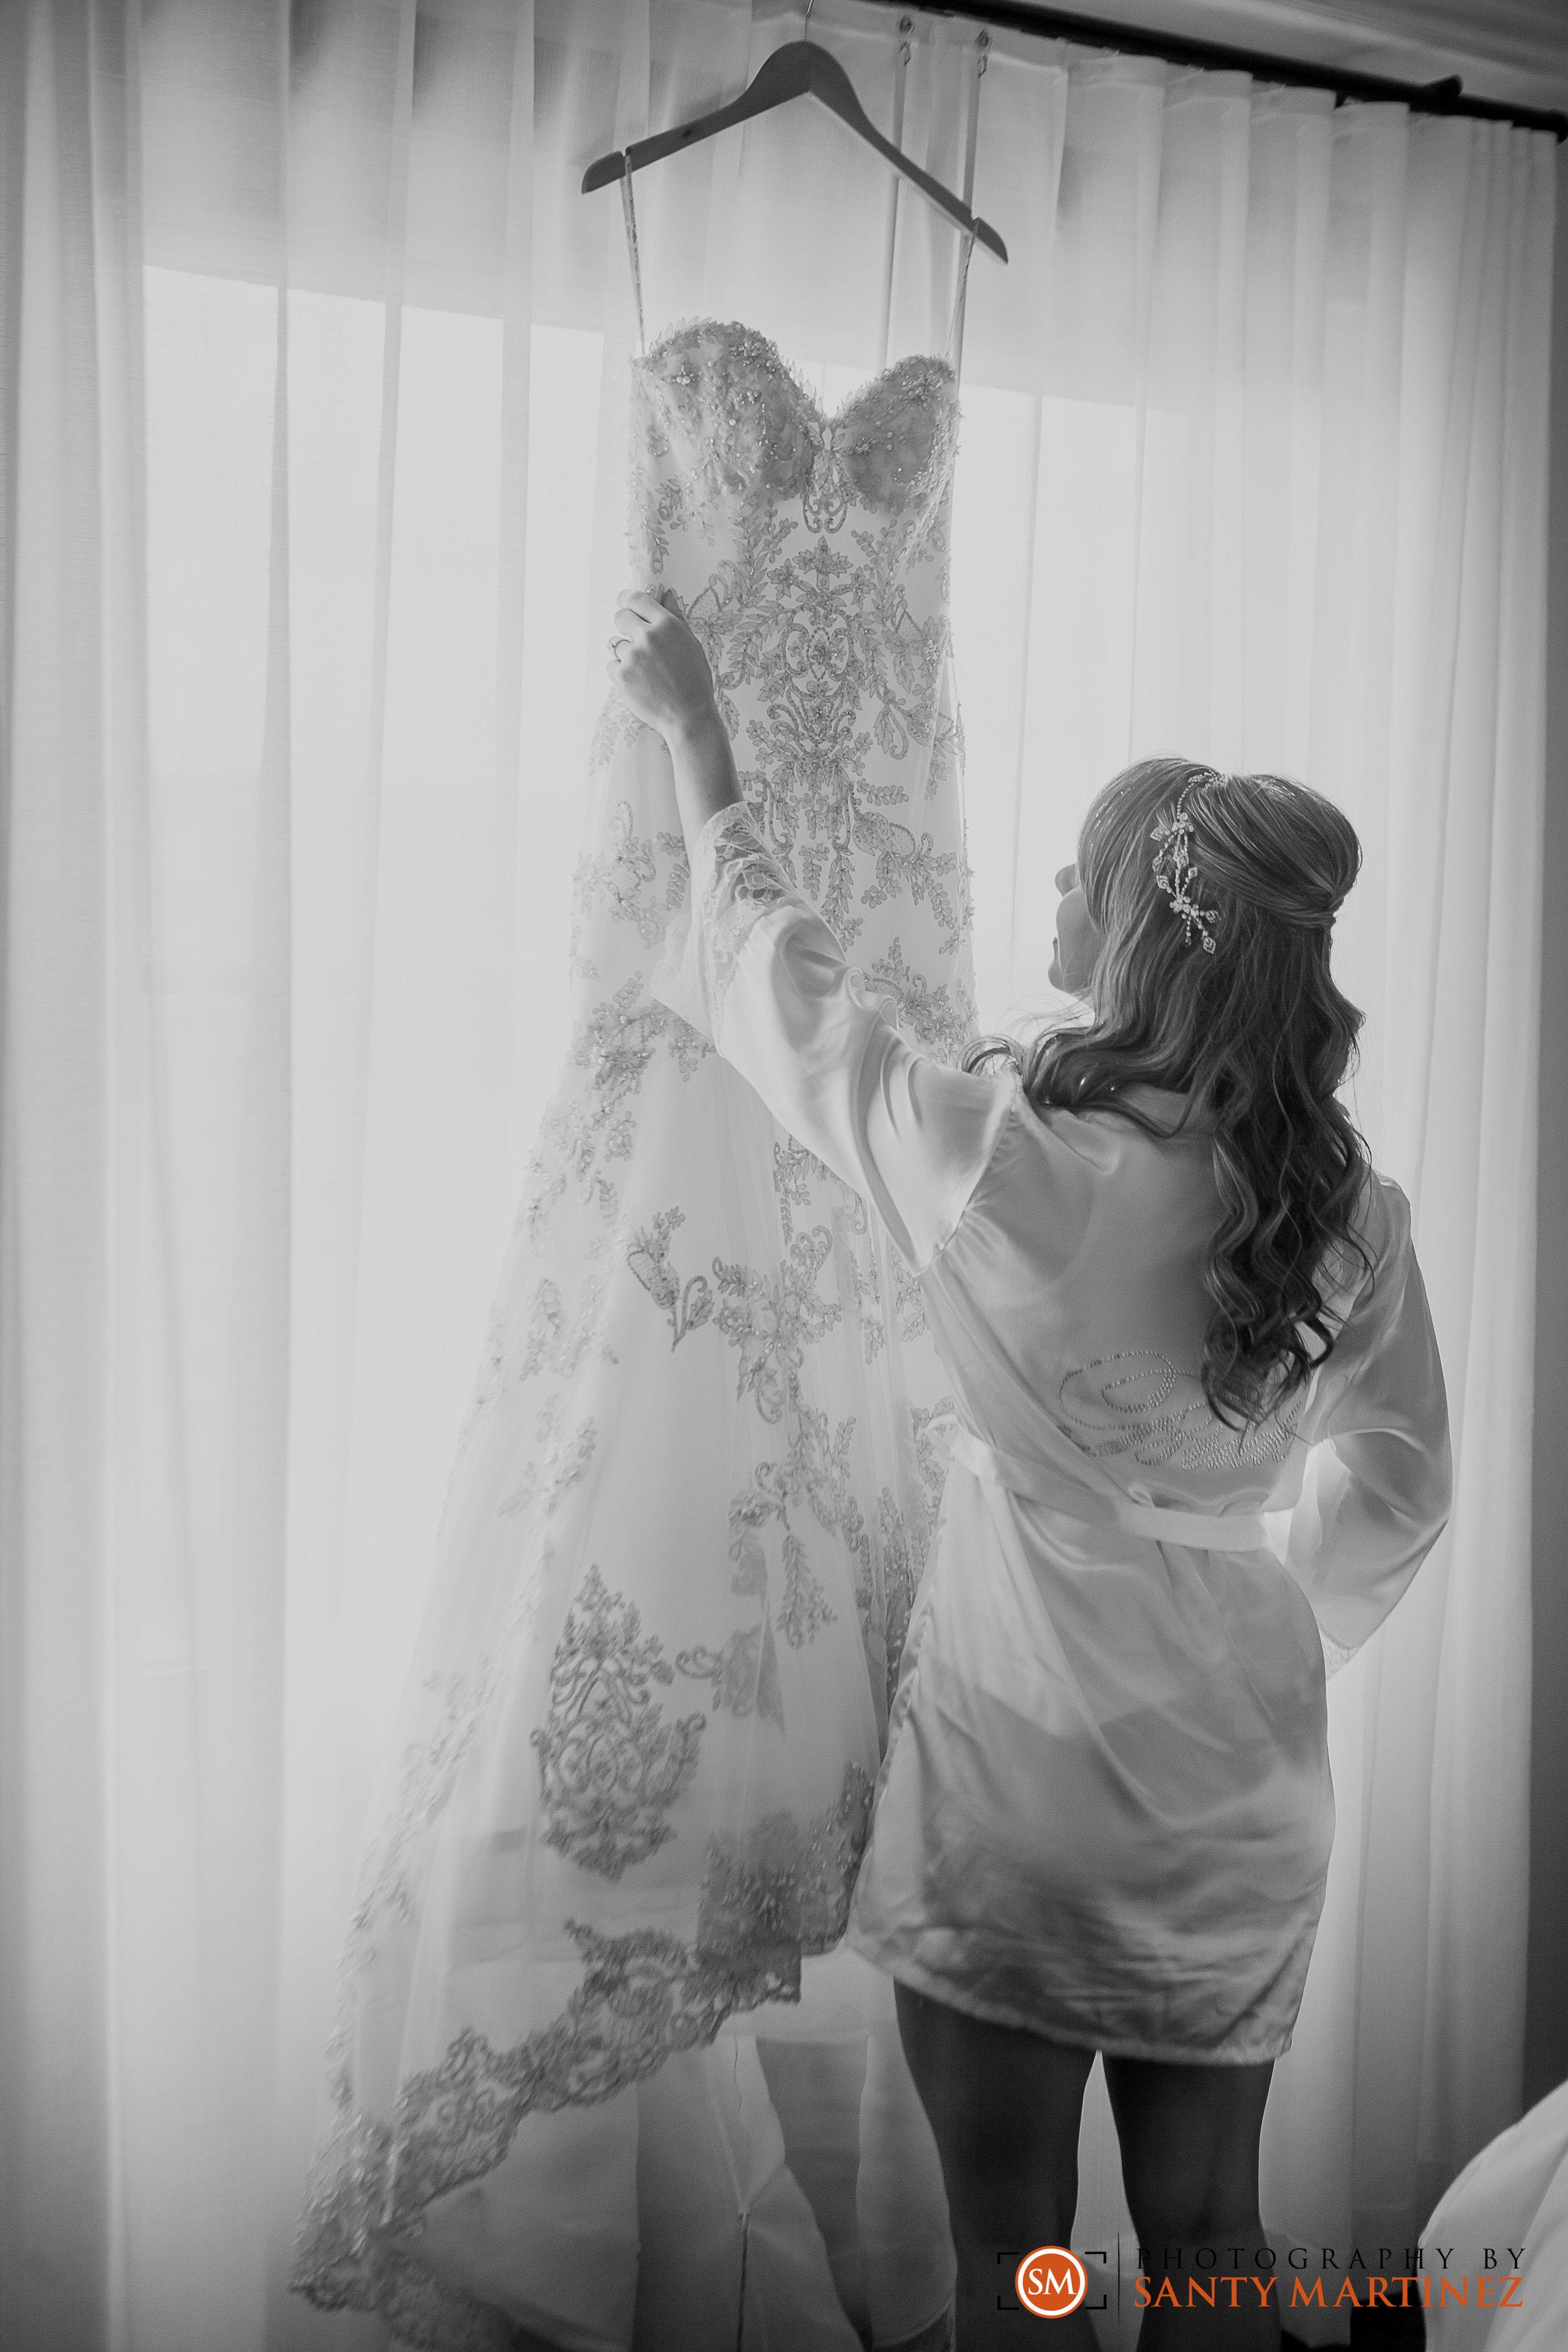 Wedding La Jolla Ballroom - Photography by Santy Martinez-8.jpg